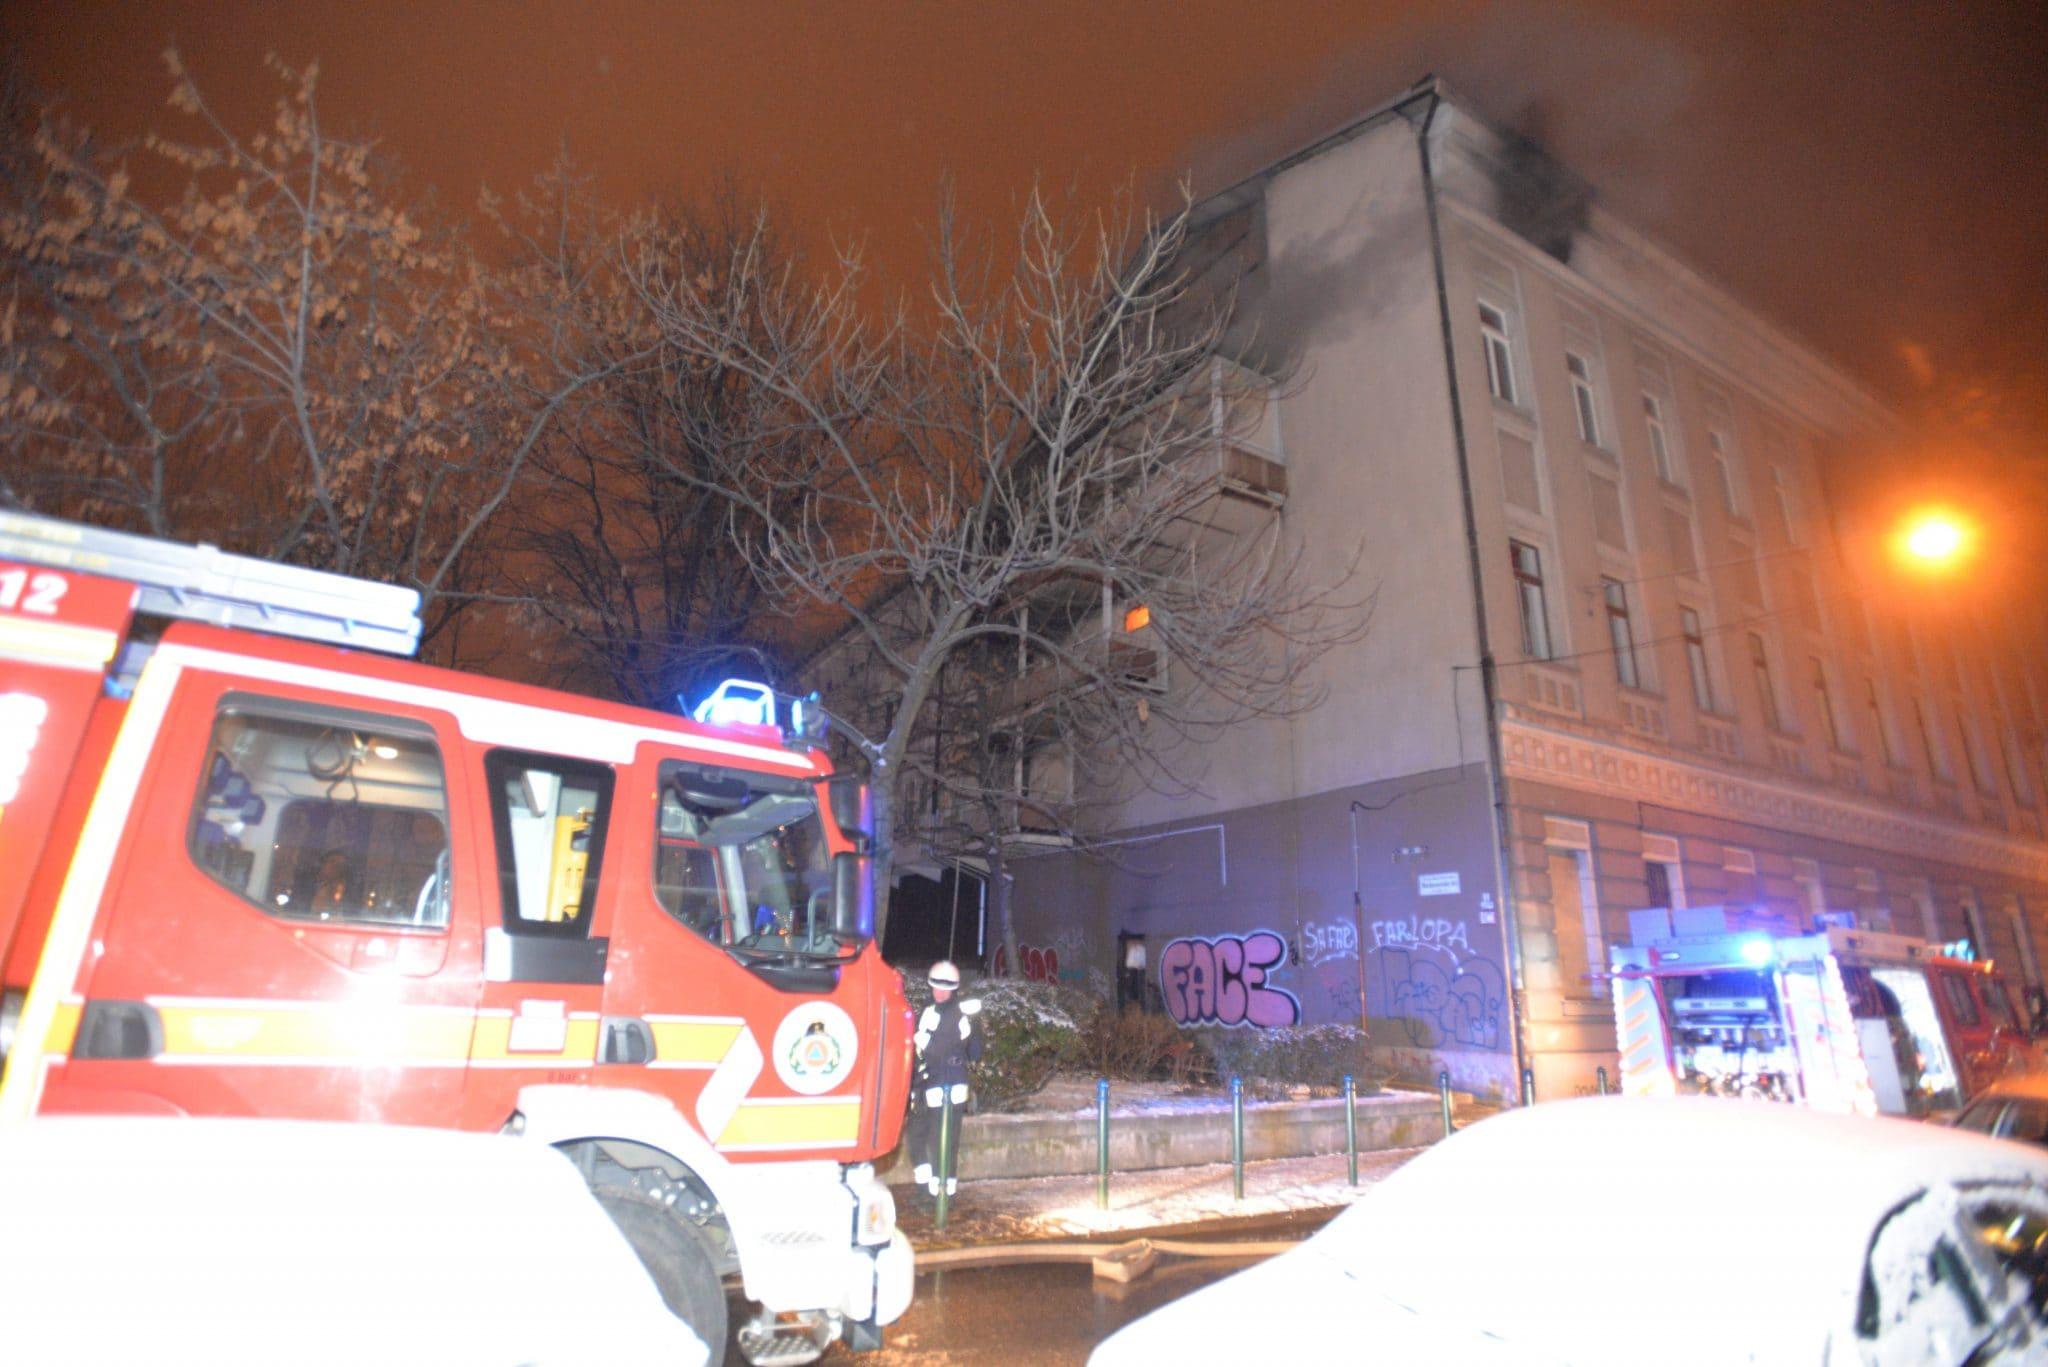 dormitory on fire Budapest